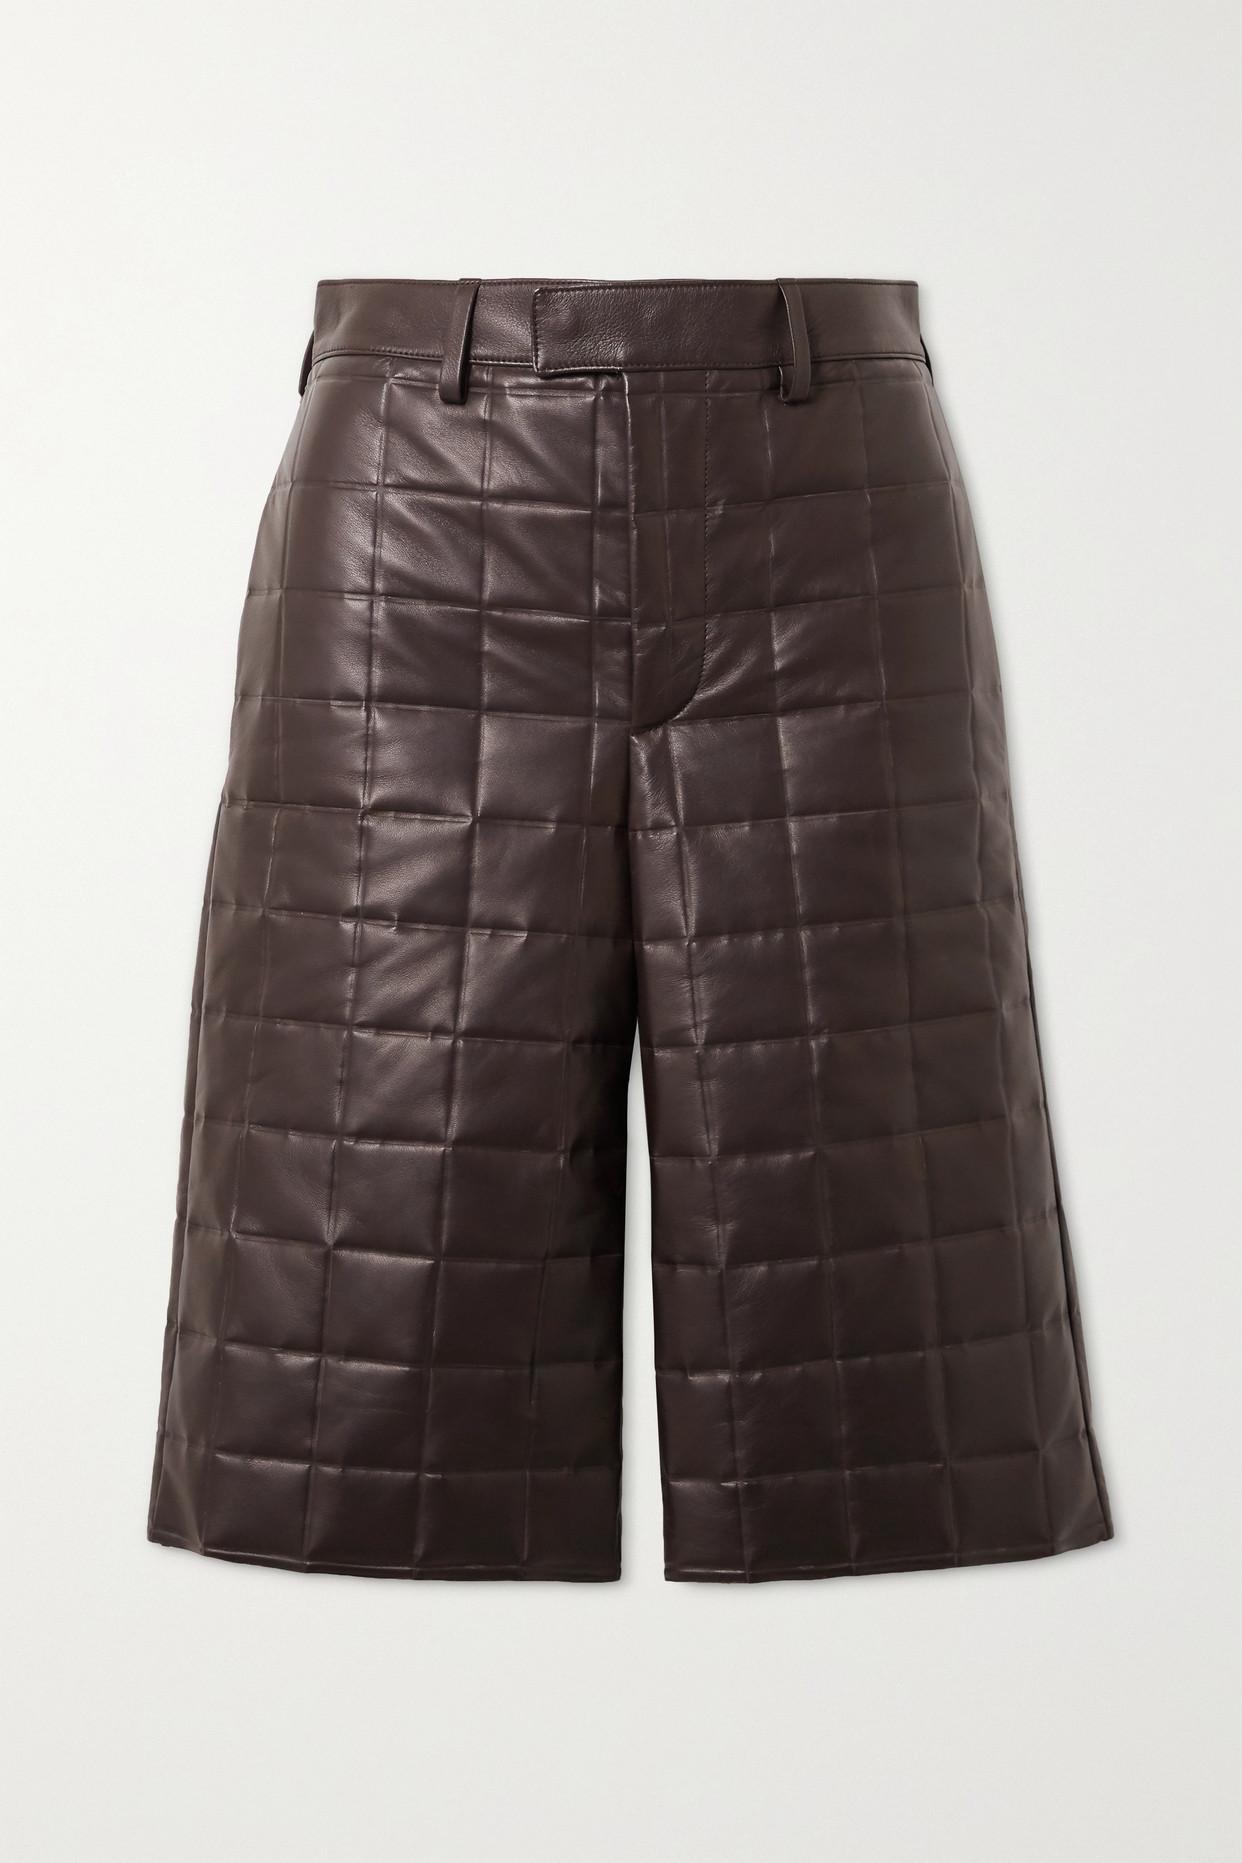 BOTTEGA VENETA - 绗缝皮革短裤 - 棕色 - IT42